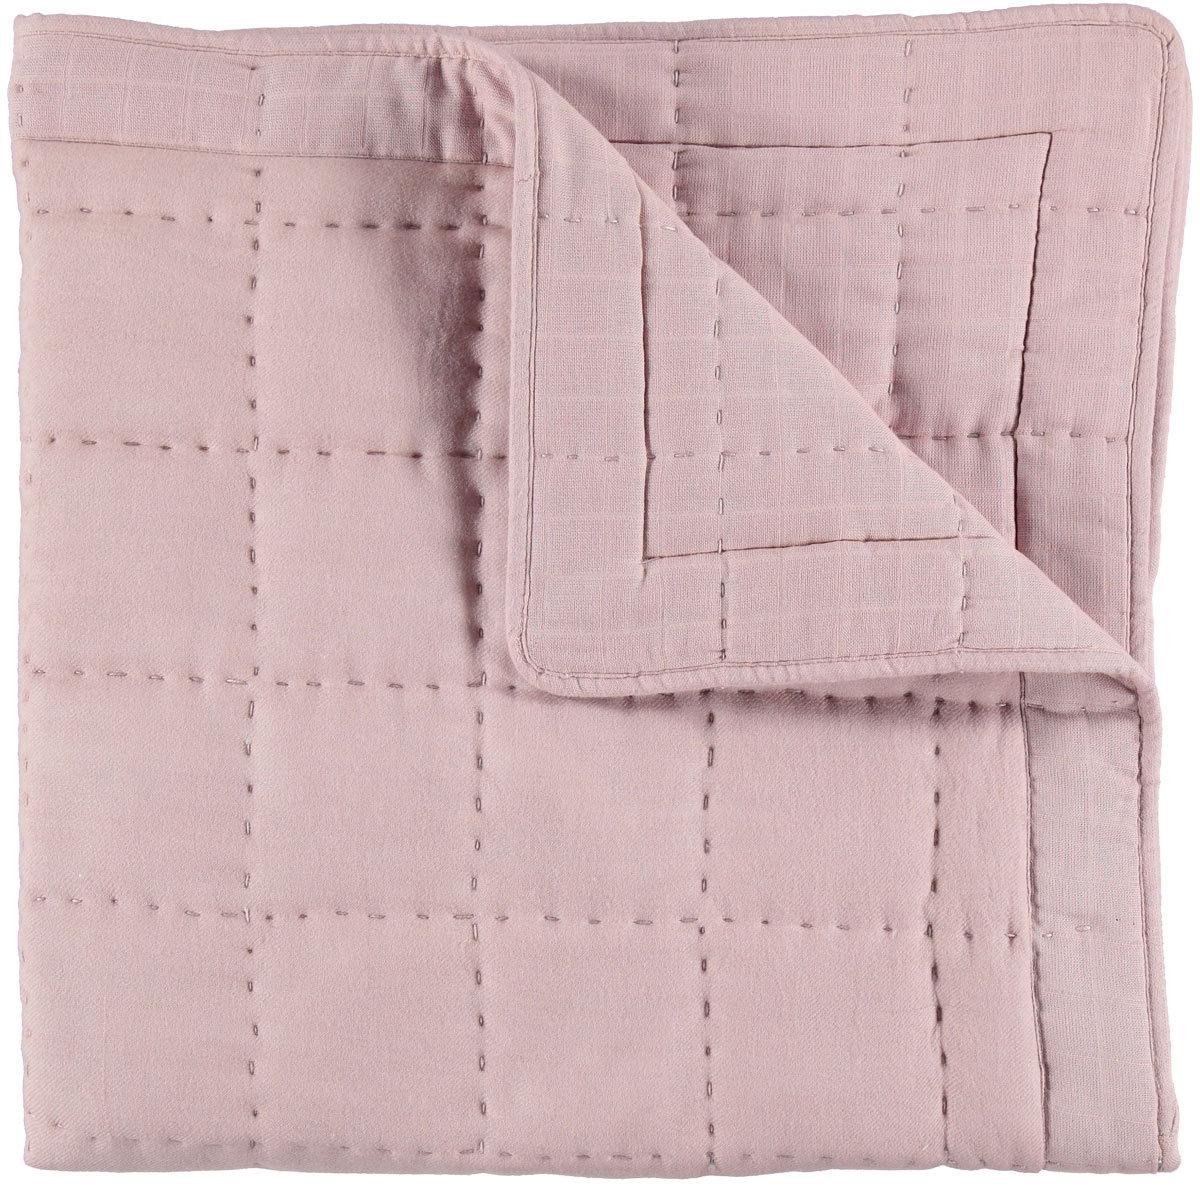 blanket boutis rose poudre 100 x 100 cm bbout1rp achat vente linge de lit sur. Black Bedroom Furniture Sets. Home Design Ideas